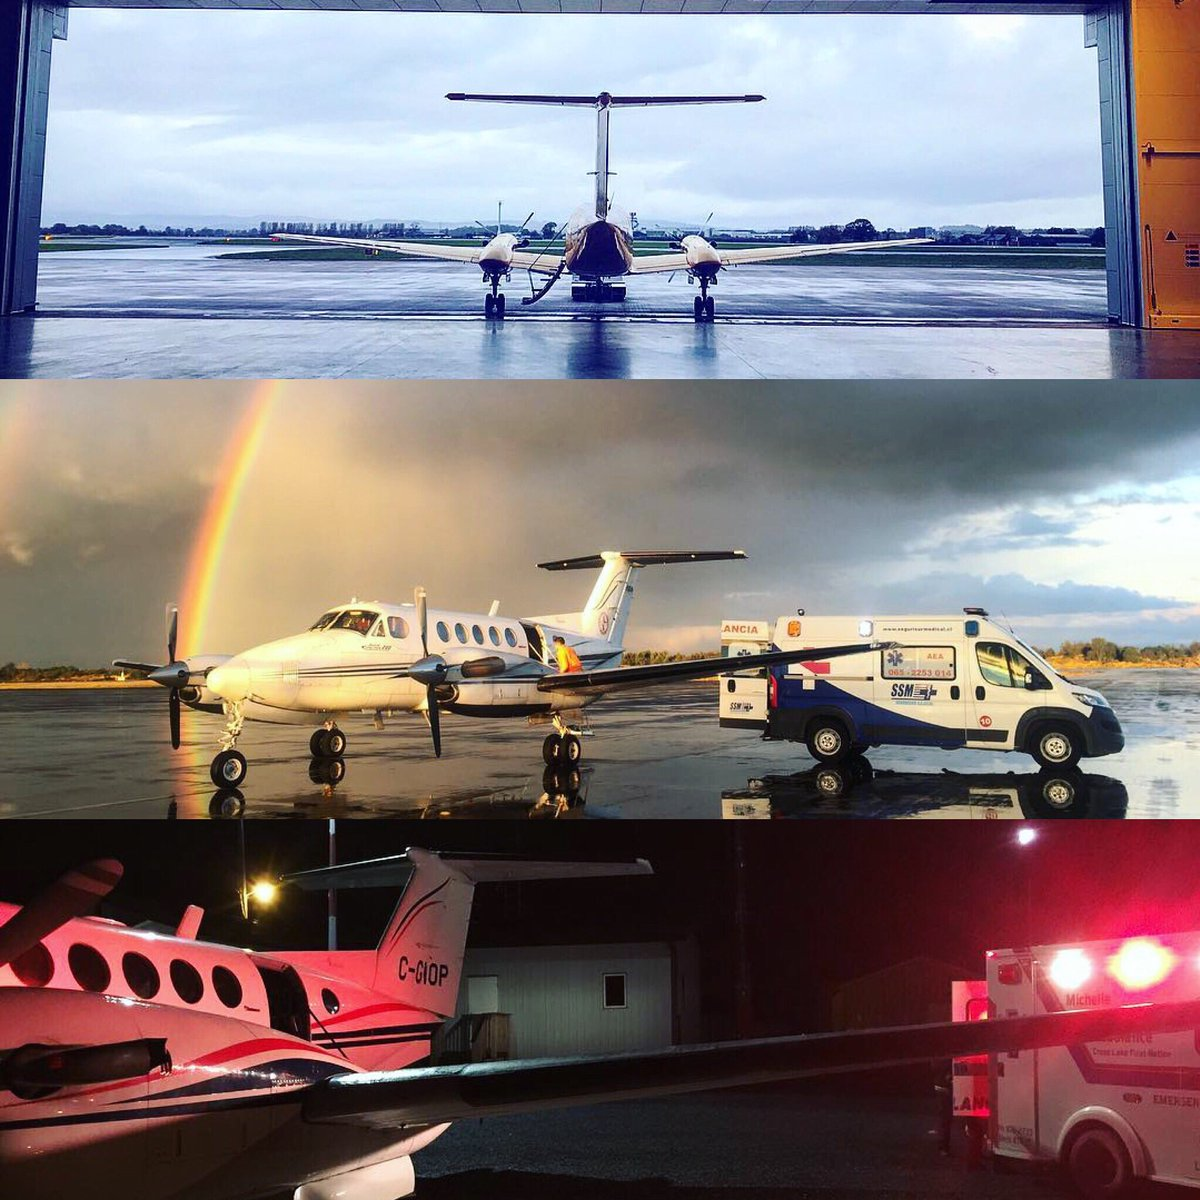 Always ready to serve; #kingair #airambulance. : @capt_dan1 (top), @totobrand (mid) and @morrow_air (bottom). #flyingfriday #kingairnation<br>http://pic.twitter.com/9stlcAtYxh